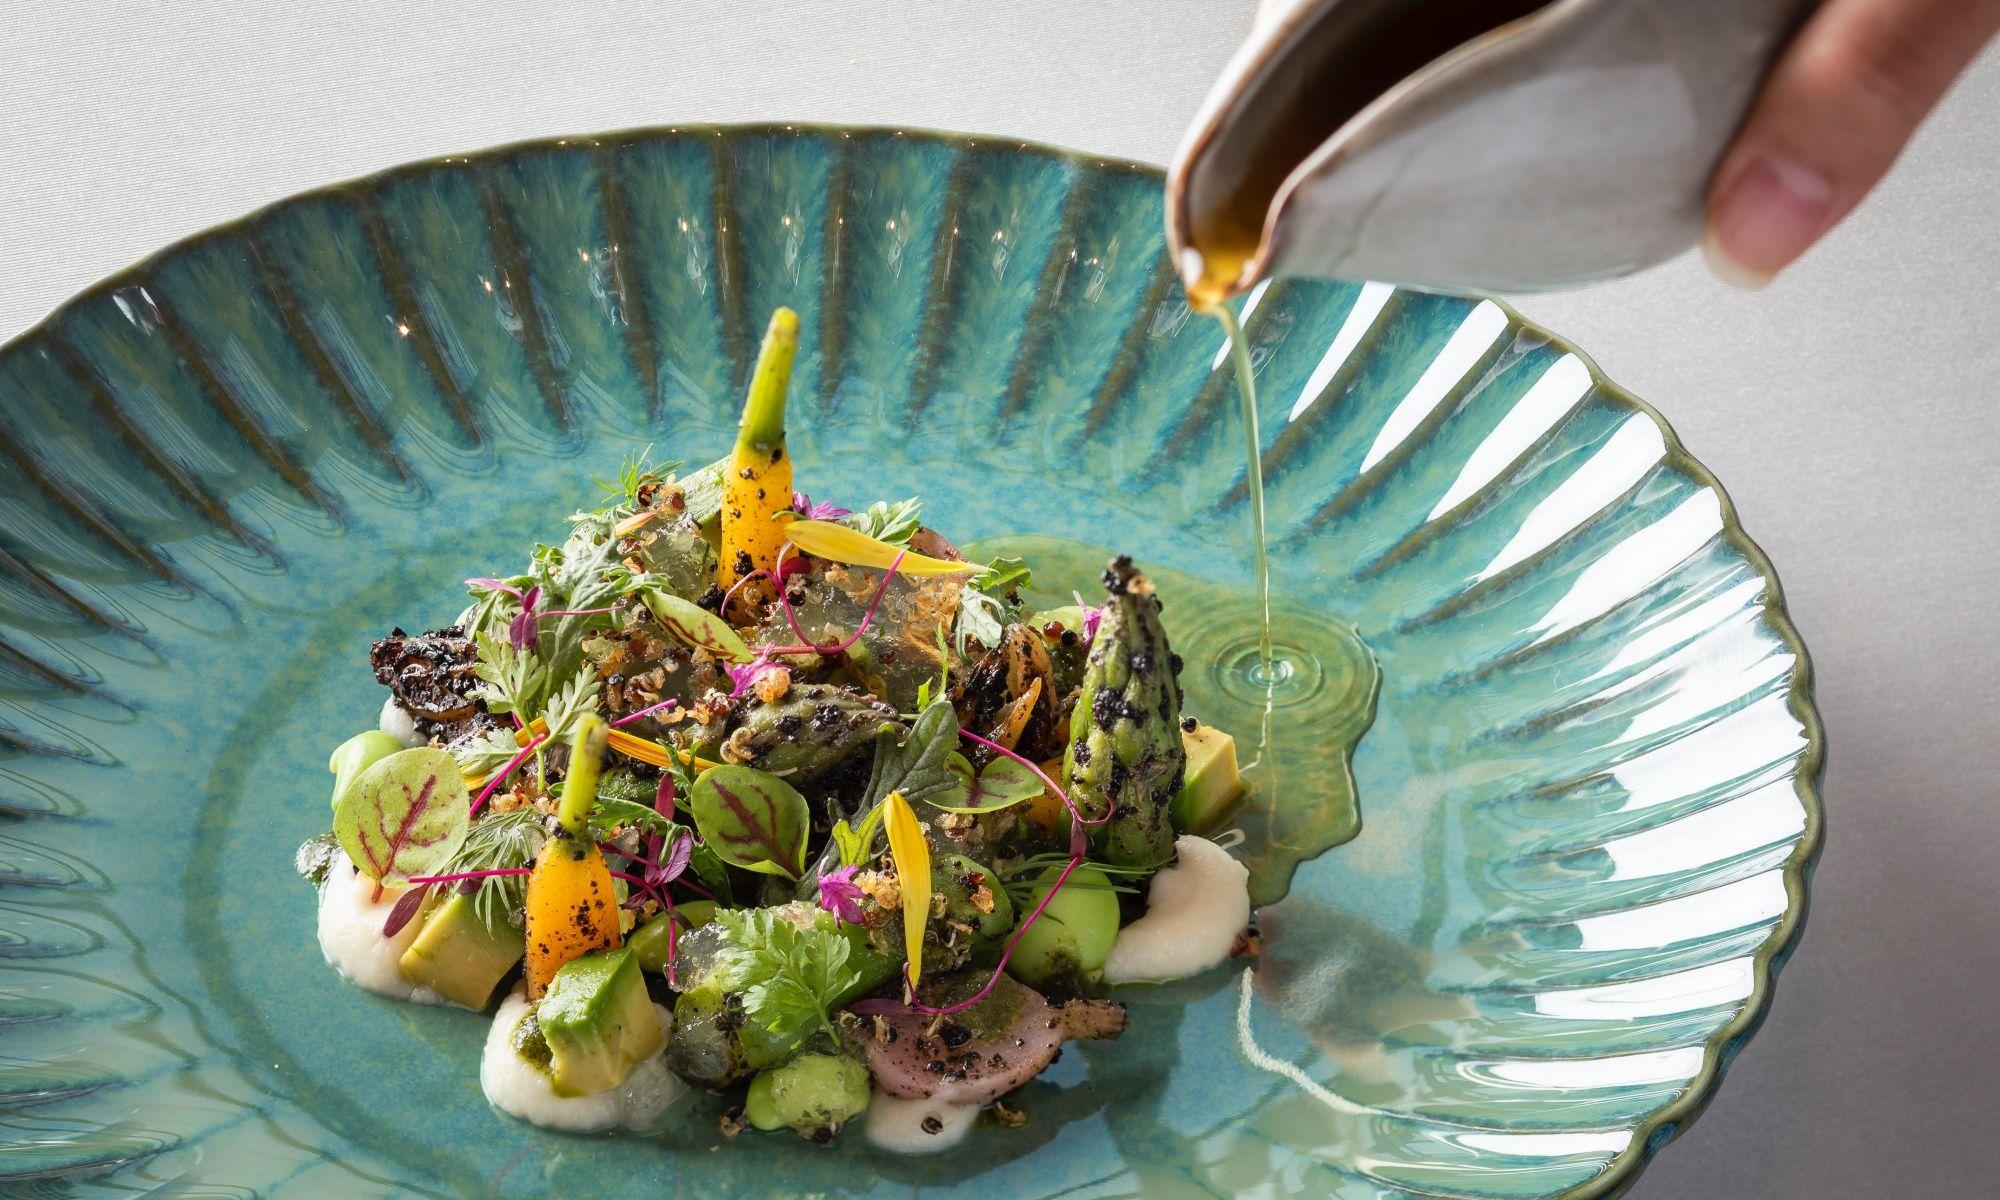 Restaurant Review: Central's Zest By Konishi Runs Smooth But Lacks Surprises